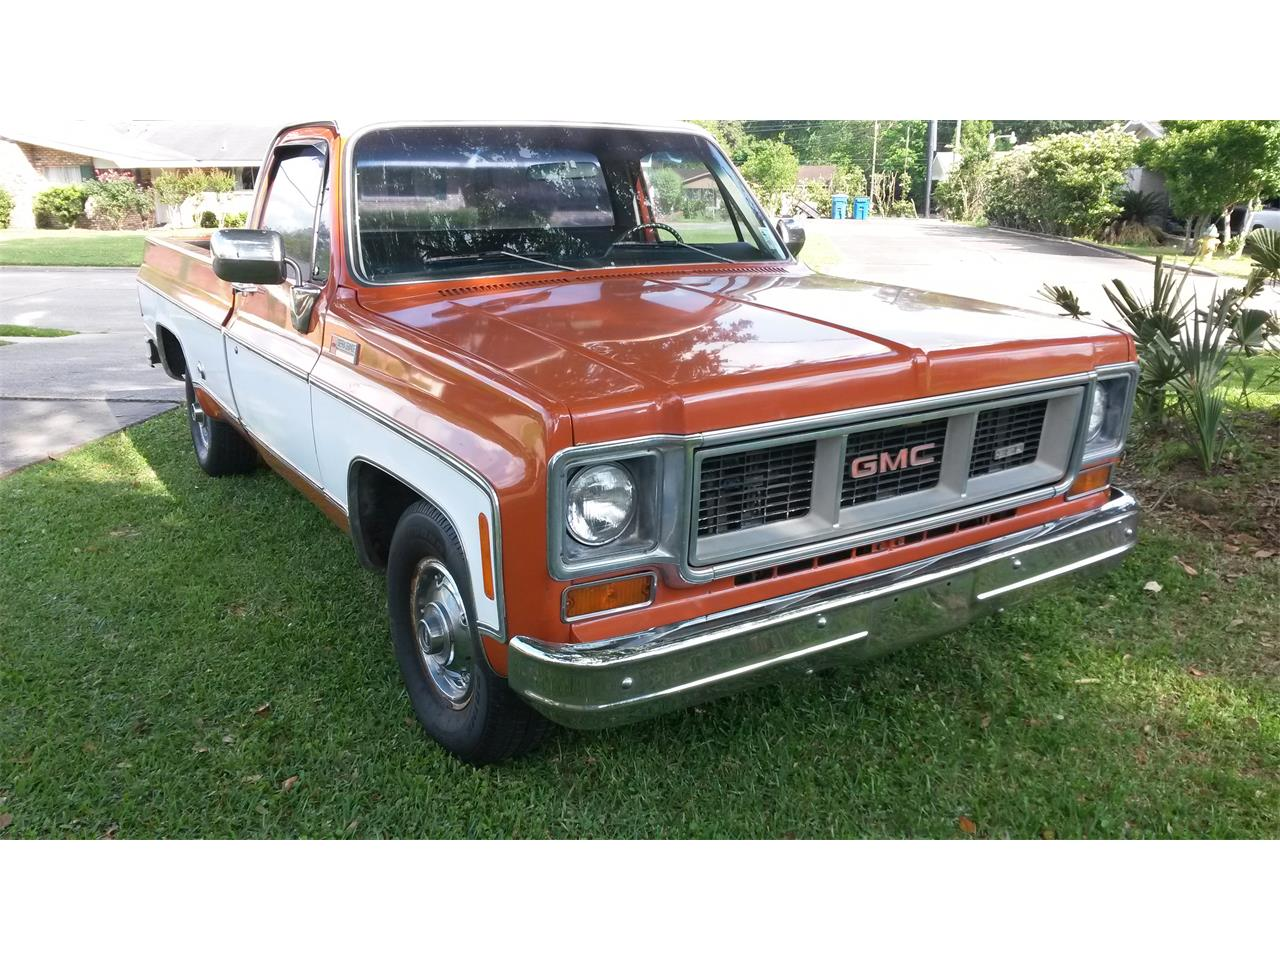 1974 Gmc Sierra Grande For Sale Classiccars Com Cc 1211923